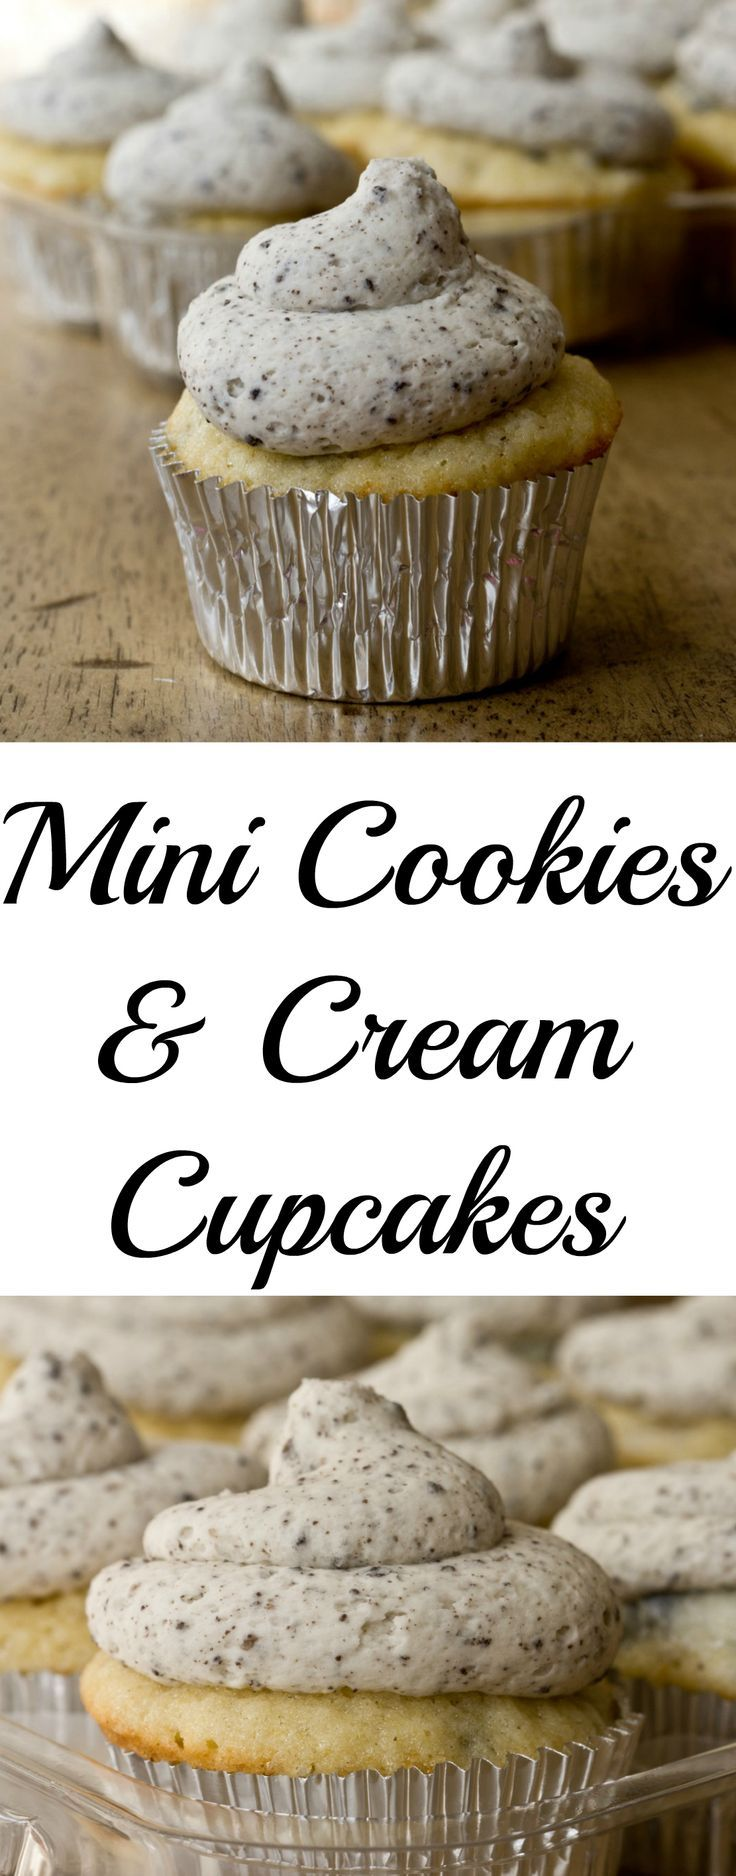 The best oreo cupcakes!